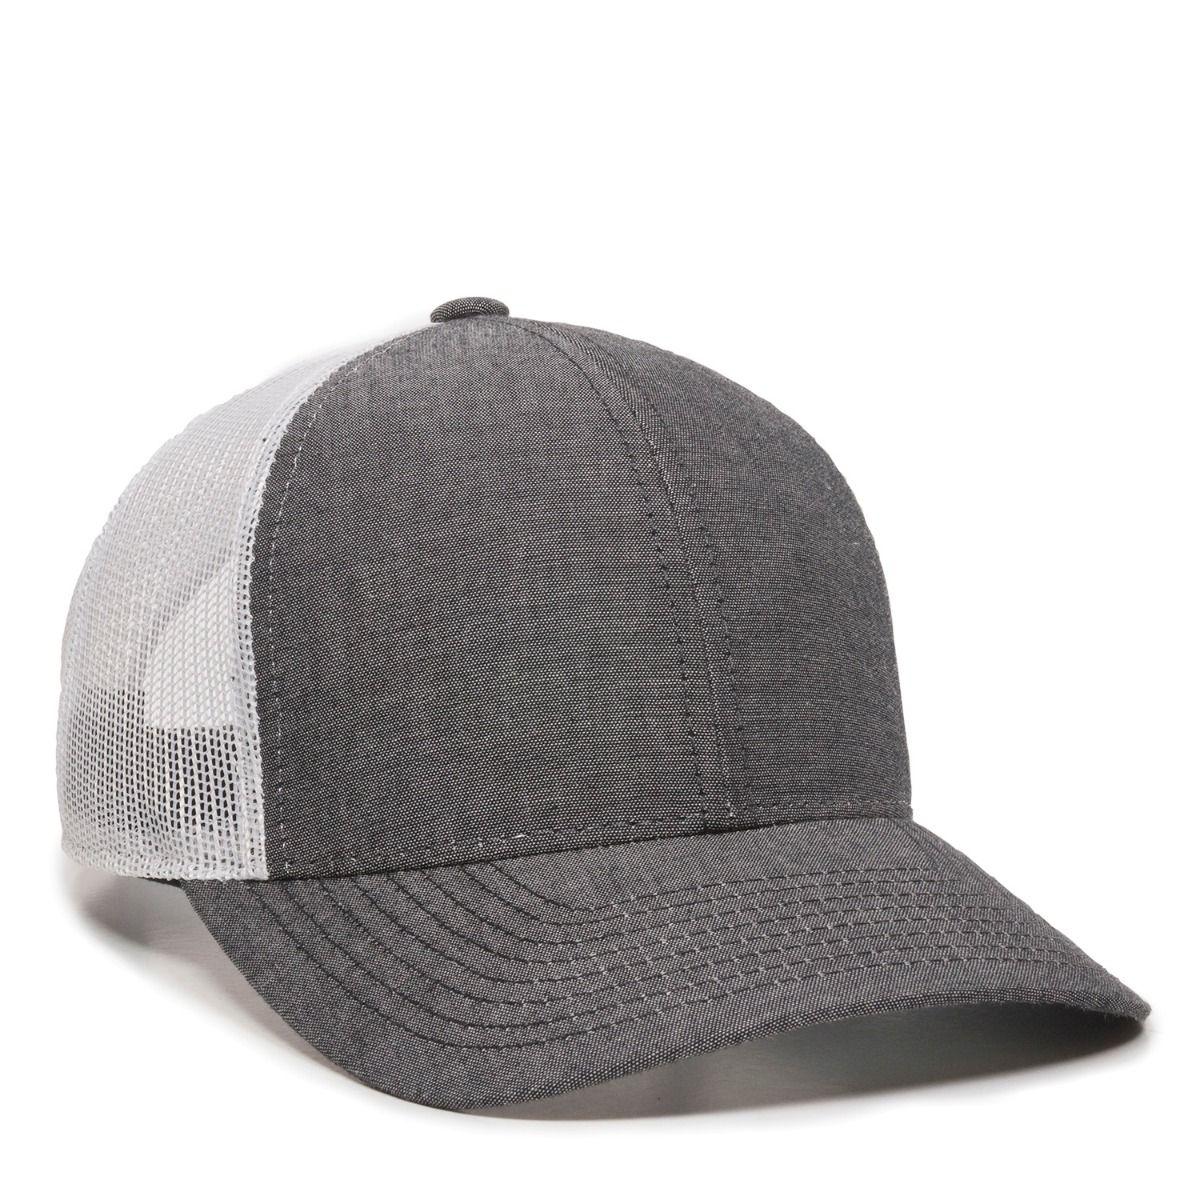 8e07b498ea0b69 MBW-800CB | Outdoor Cap - Team Headwear